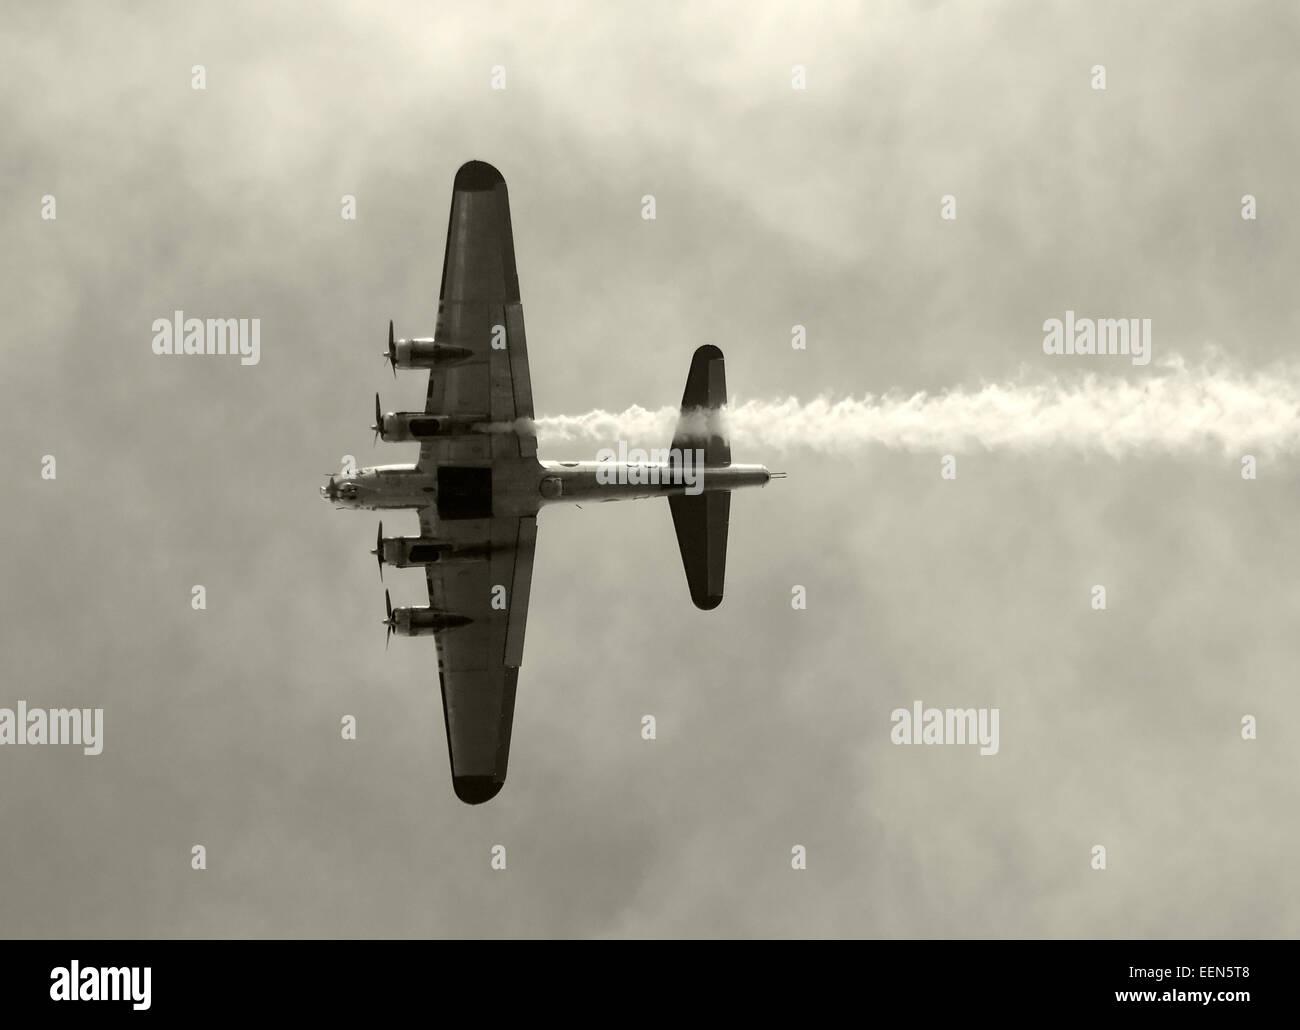 World War II era bomber in flight B-17 Flying Fortress Stock Photo